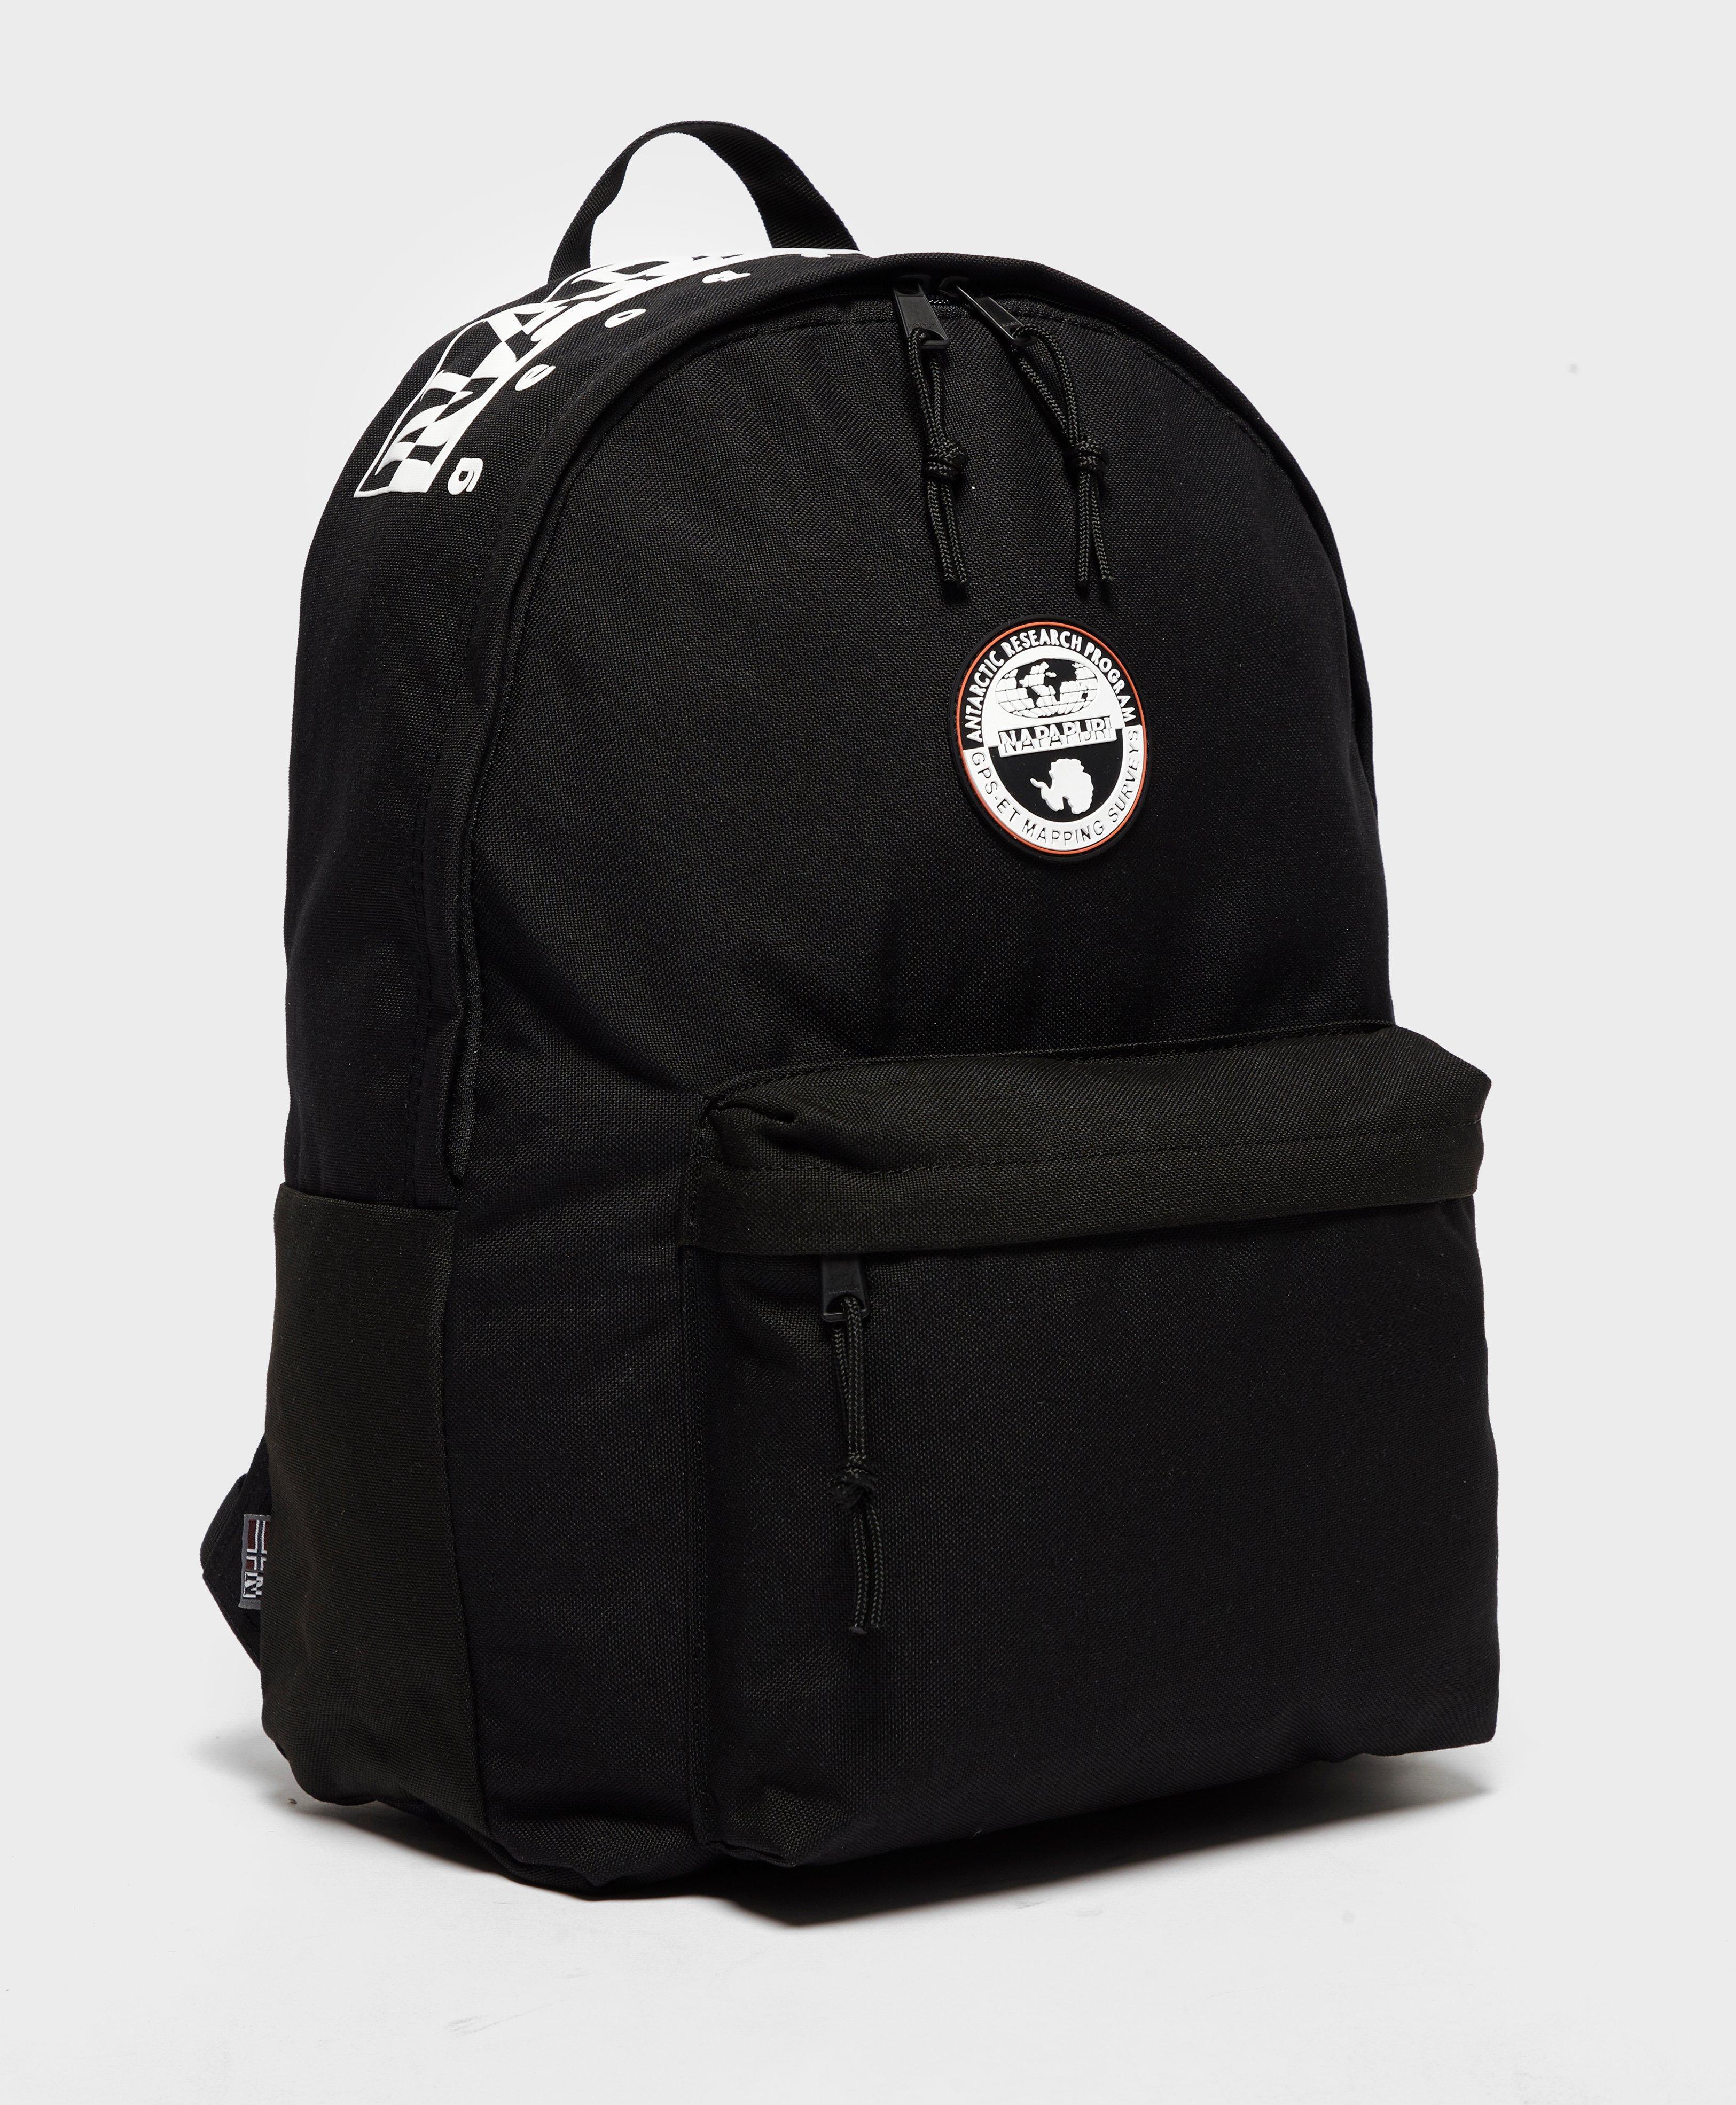 ... sale retailer 1f725 c68b4 Lyst - Napapijri Happy Day Backpack in Black  for Men ... 75d34008f3